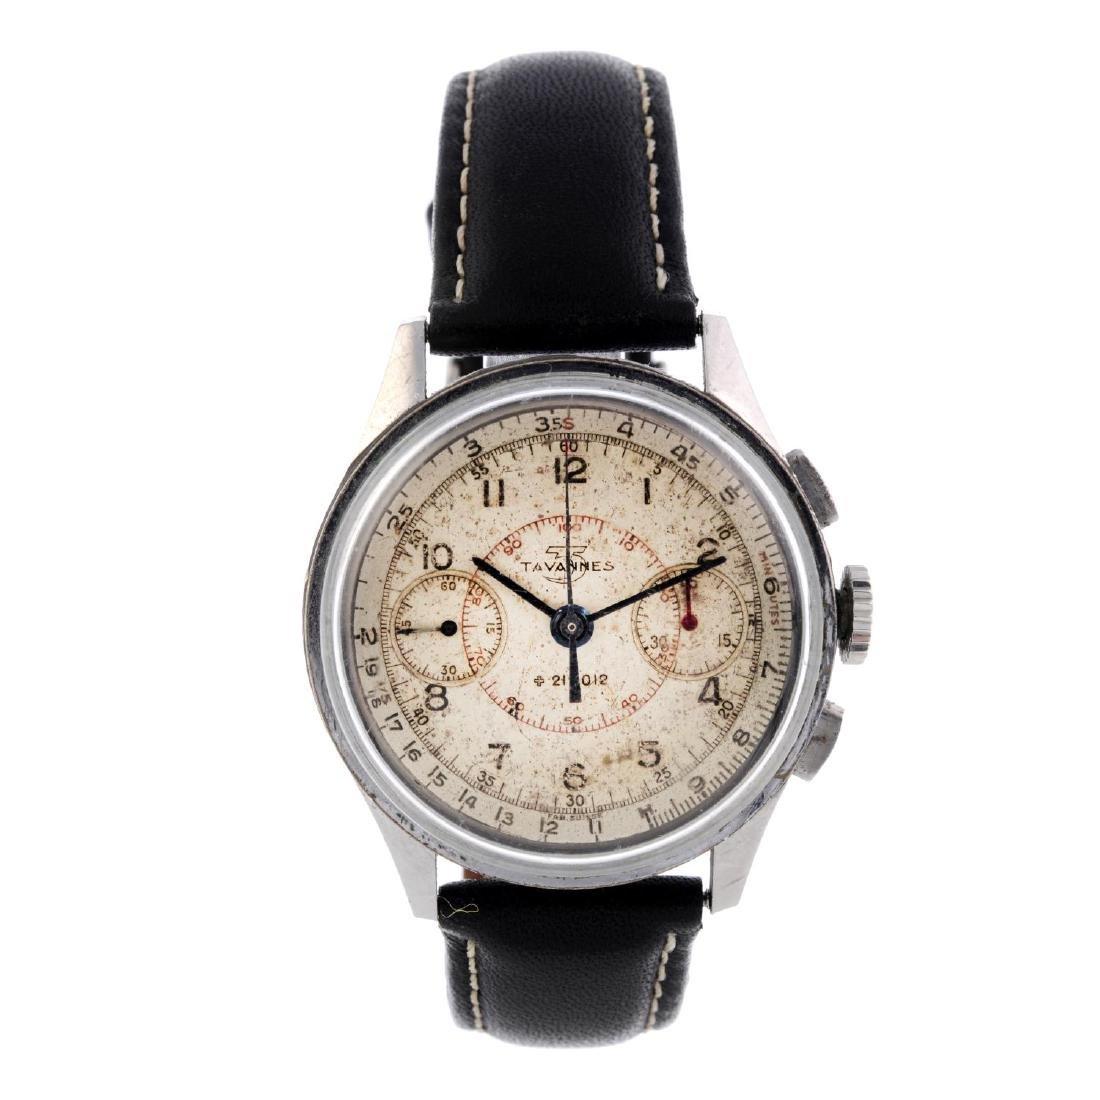 TAVANNES - a gentleman's chronograph wrist watch.